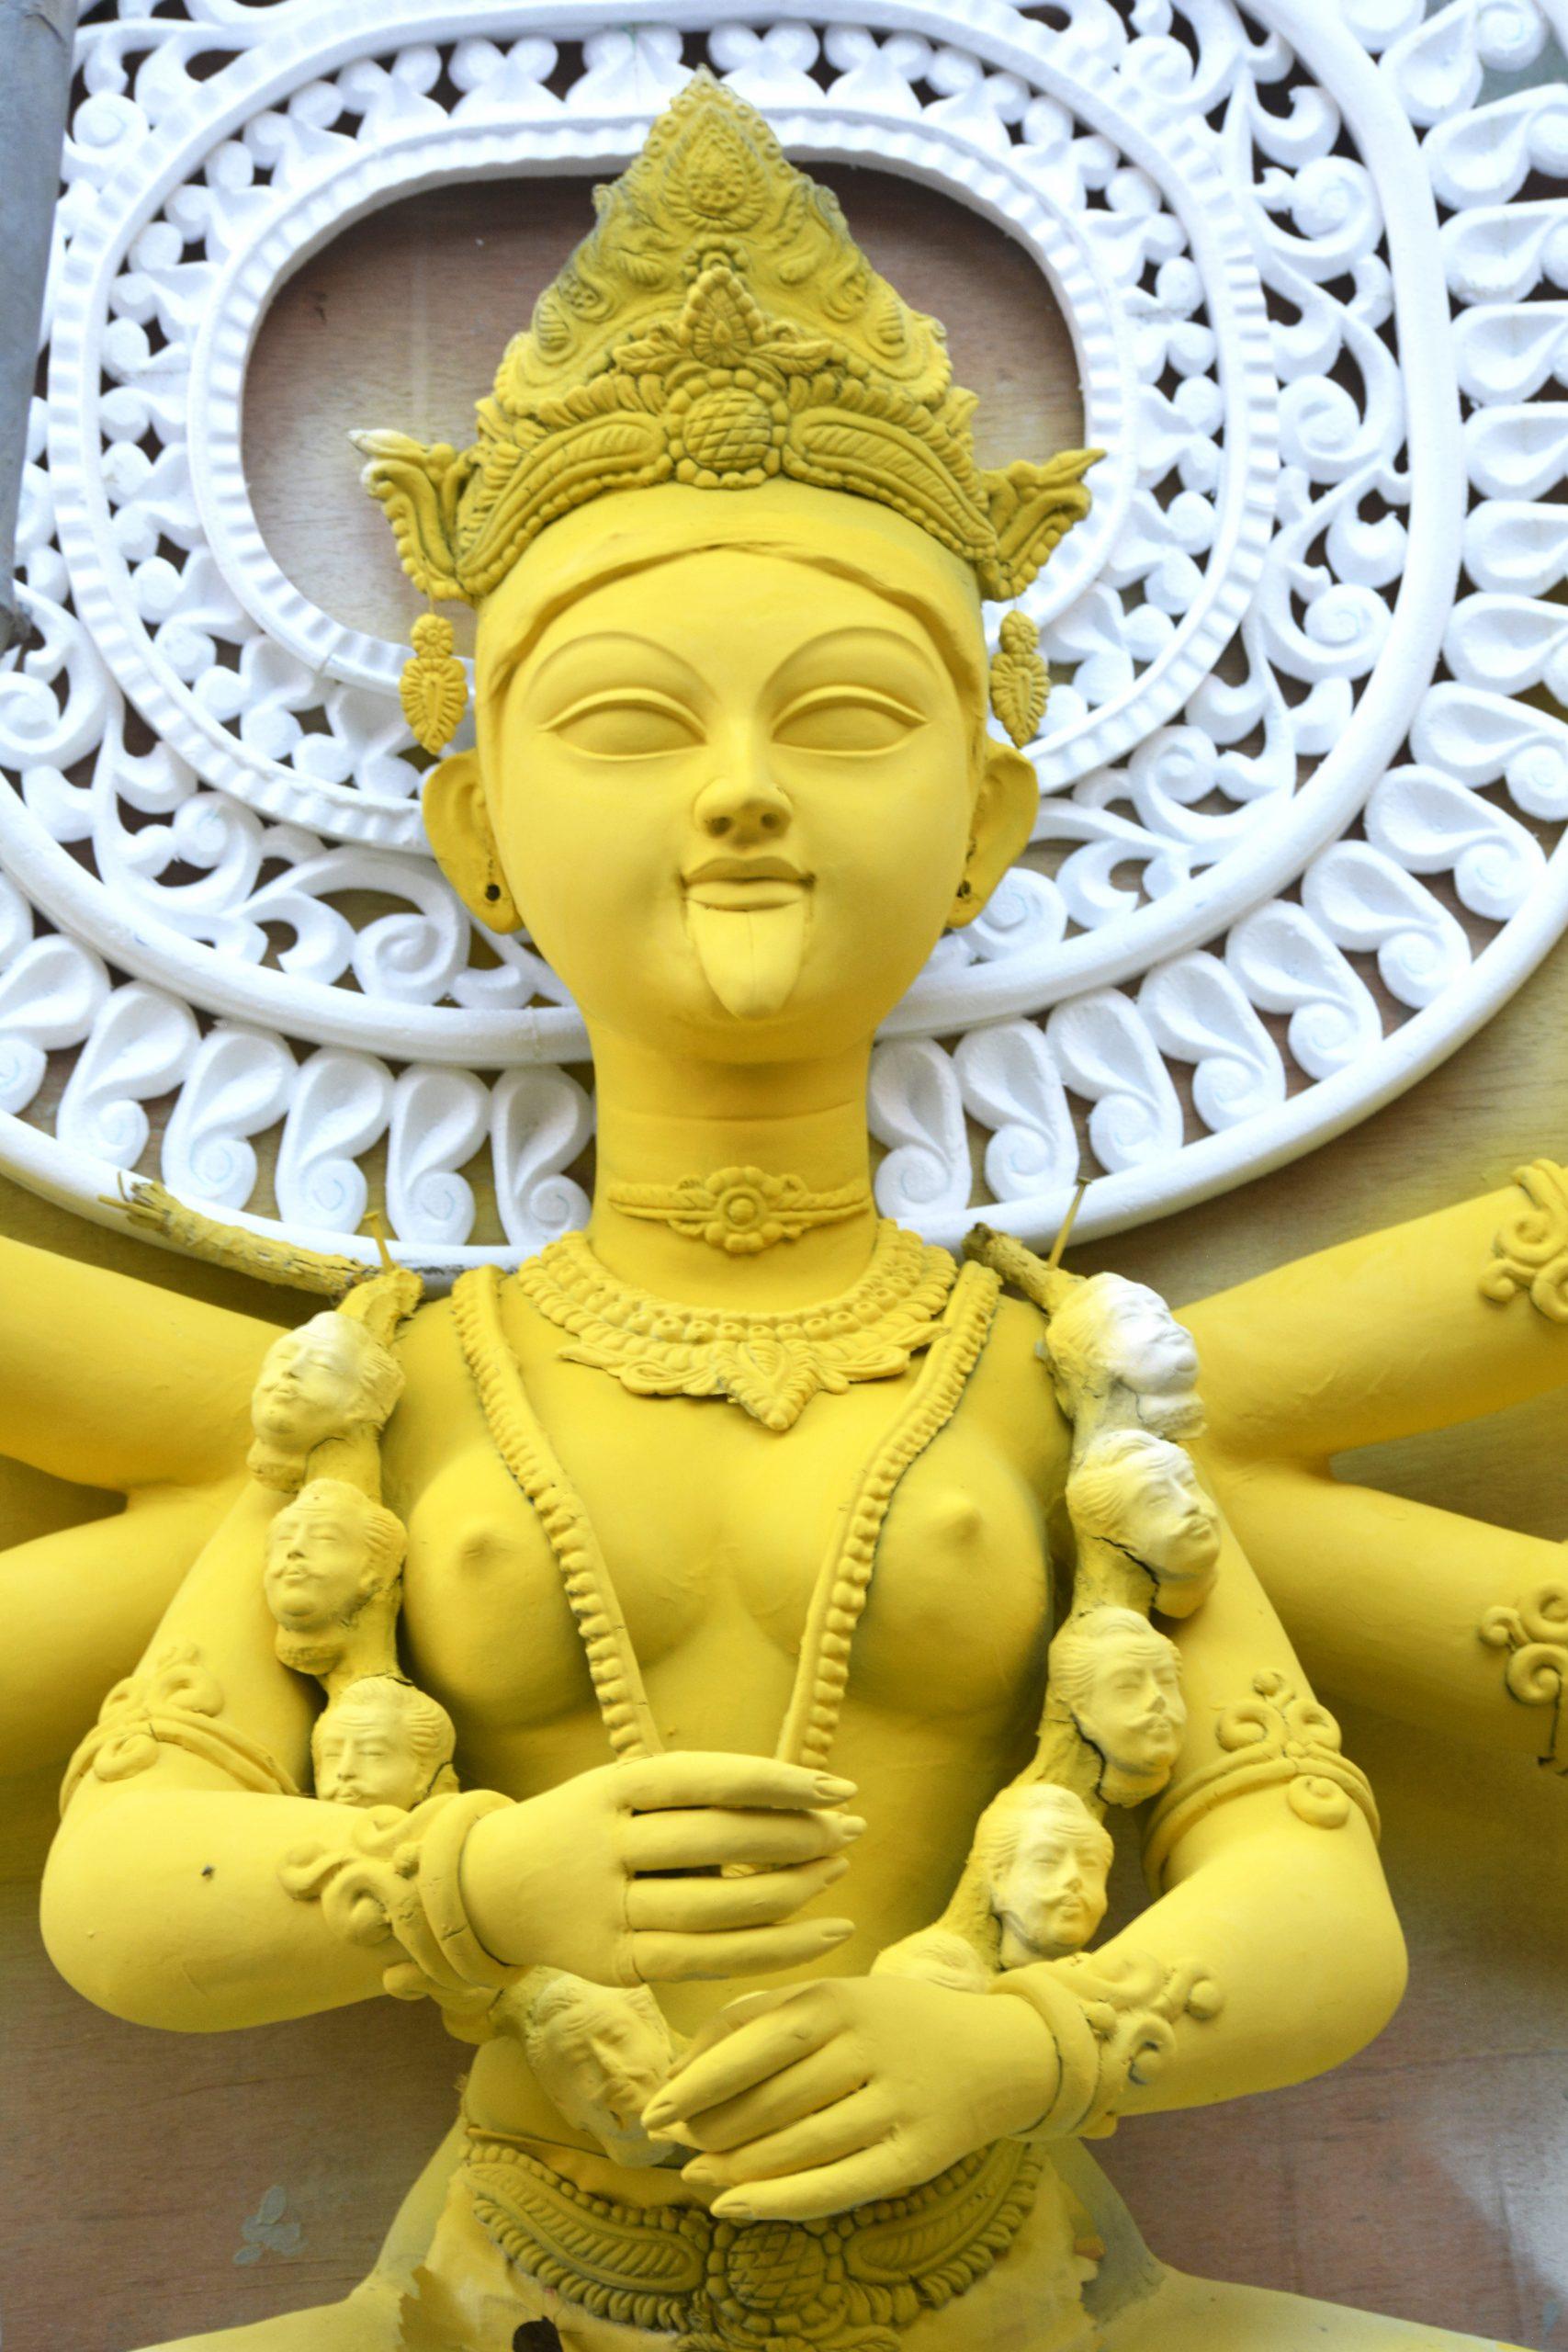 Idol of Hindu Goddess